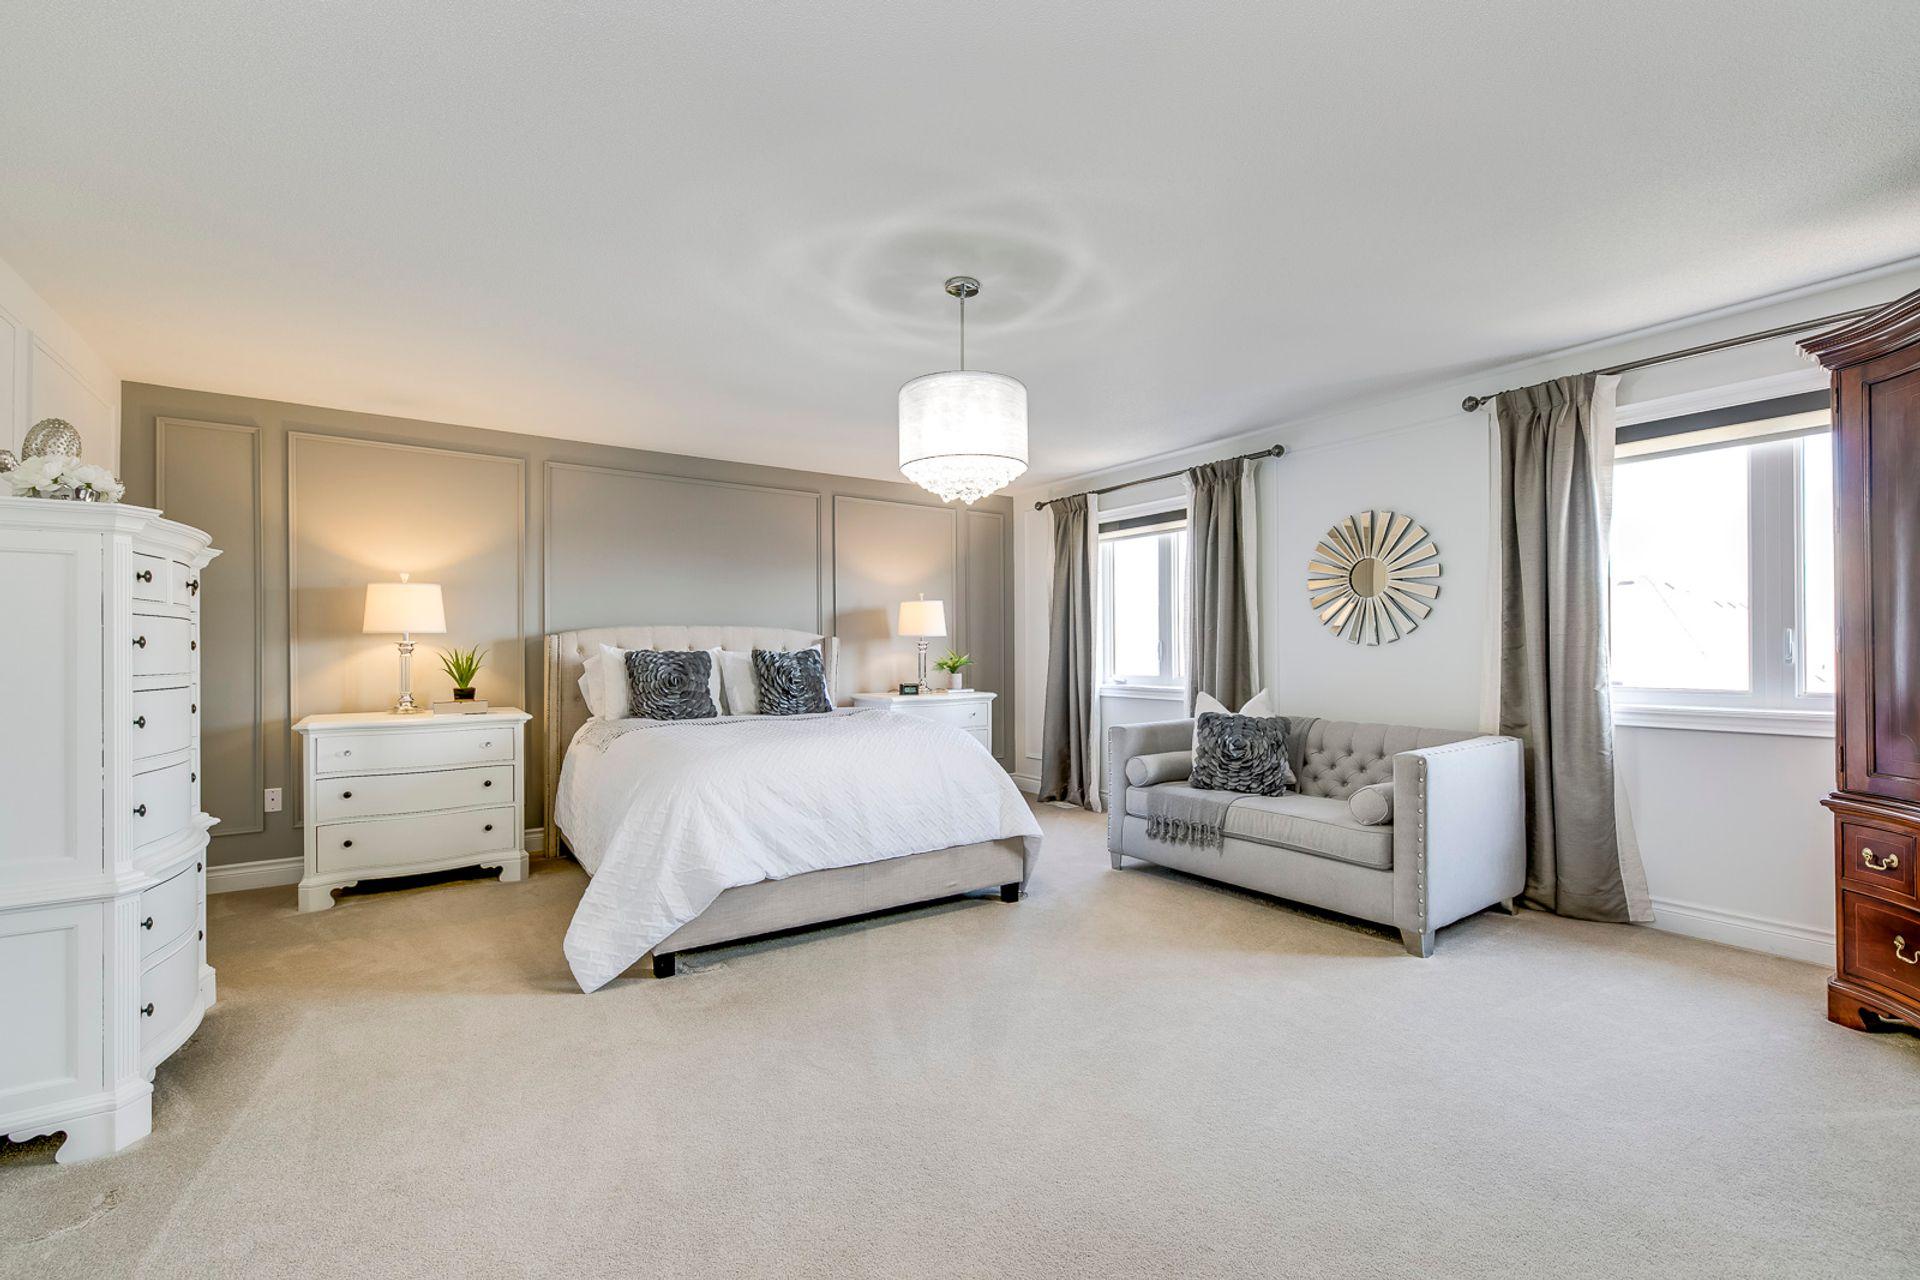 Master Bedroom - 2419 Sylvia Dr, Oakville - Elite3 & Team at 2419 Sylvia Drive, Iroquois Ridge North, Oakville